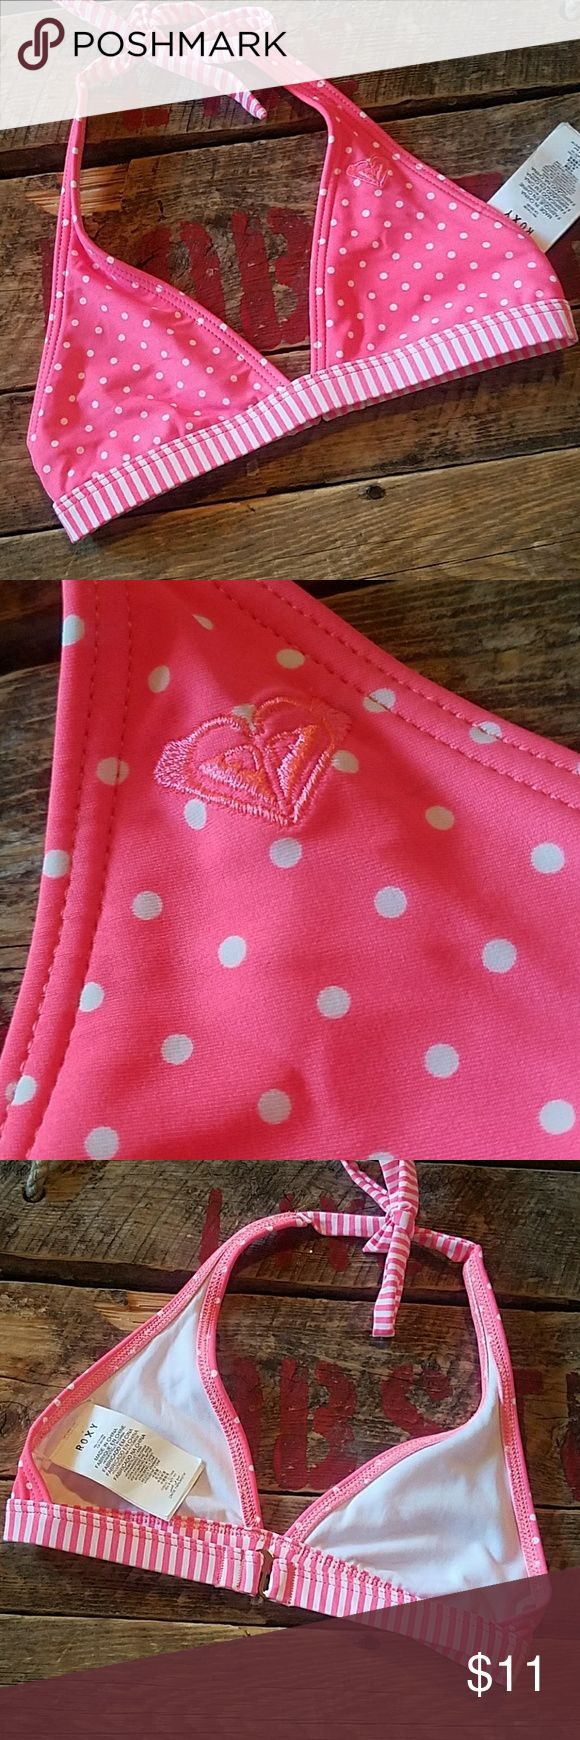 NWT ROXY Bikini Top New With Tags Pink Stripped & Polka Dot Bikini Top. Neck ties, back closure Size 6-8 Roxy Swim Bikinis